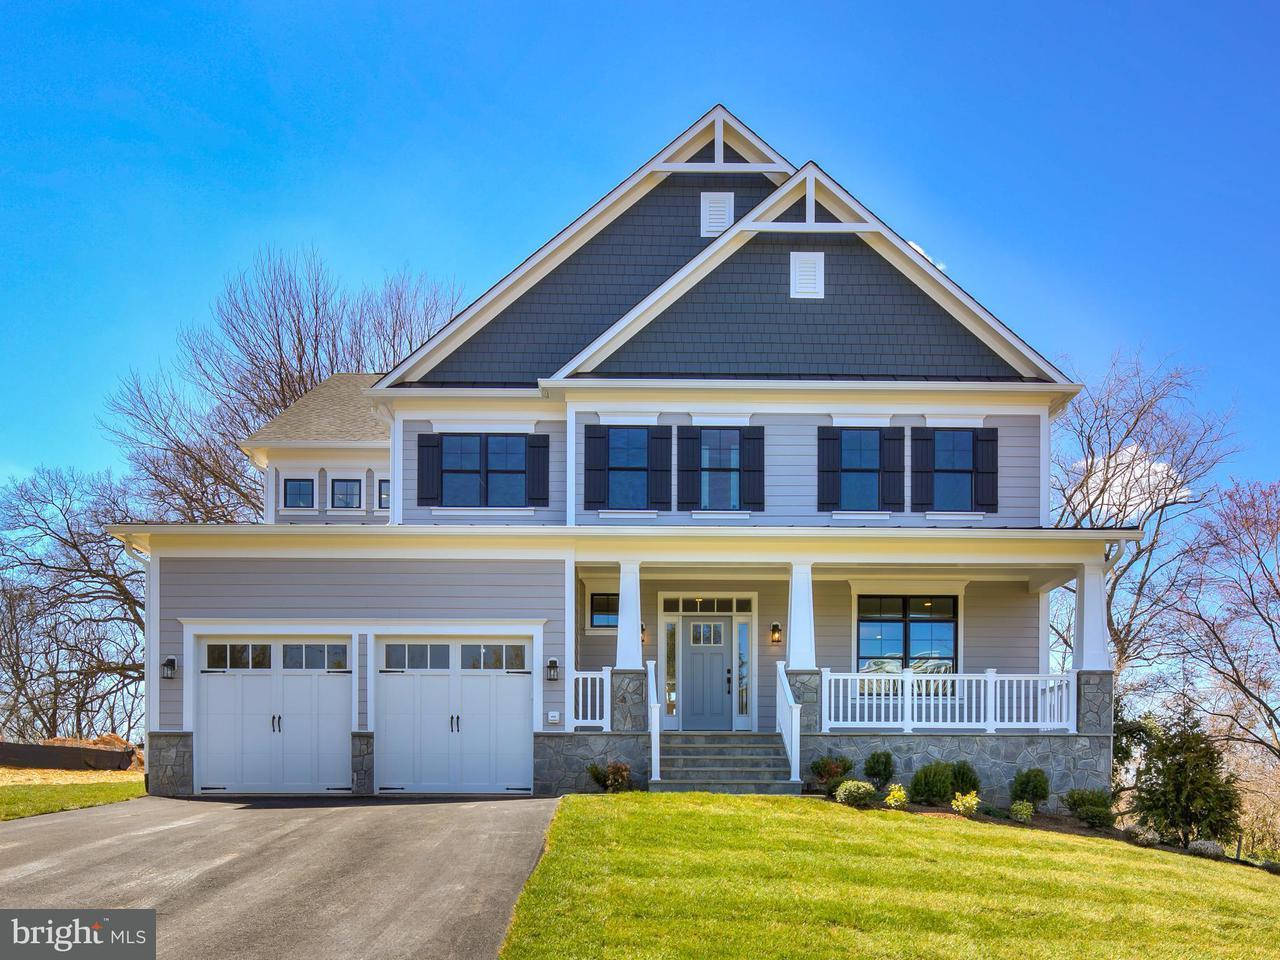 Single Family Home for Sale at 3000 BEECHWOOD Lane 3000 BEECHWOOD Lane Falls Church, Virginia 22042 United States